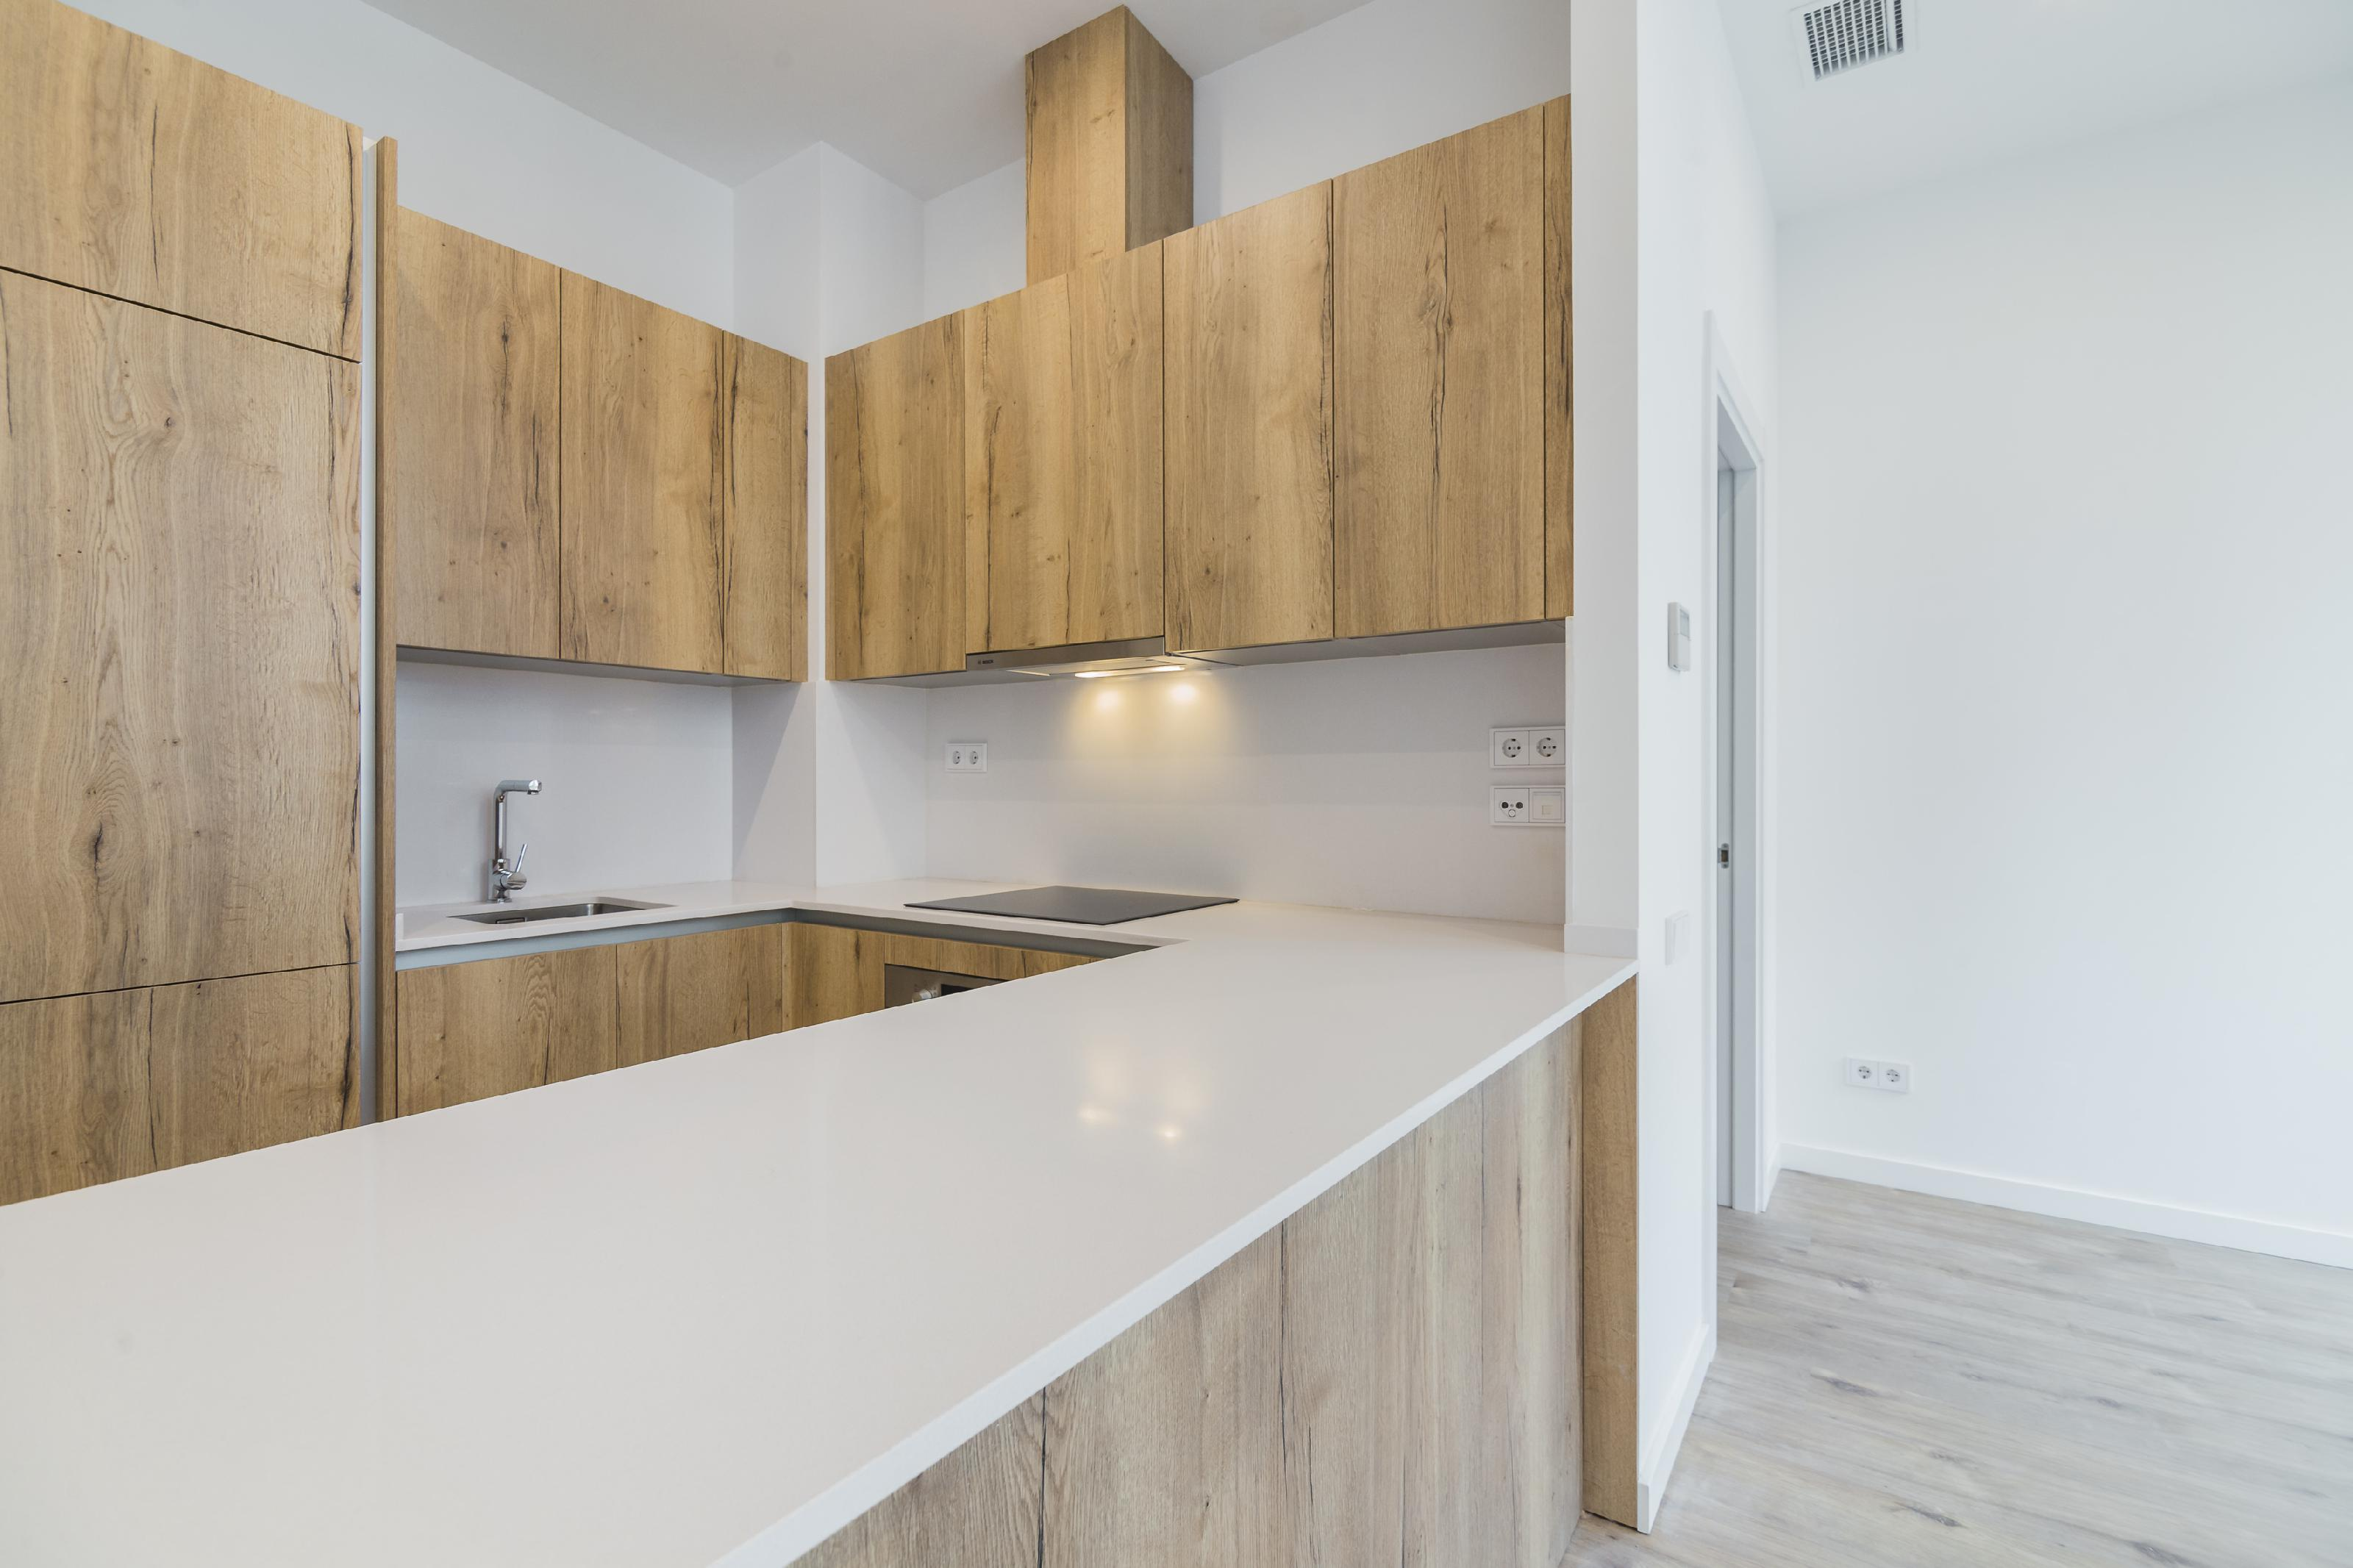 249860 Flat for sale in Eixample, Nova Esquerra Eixample 6